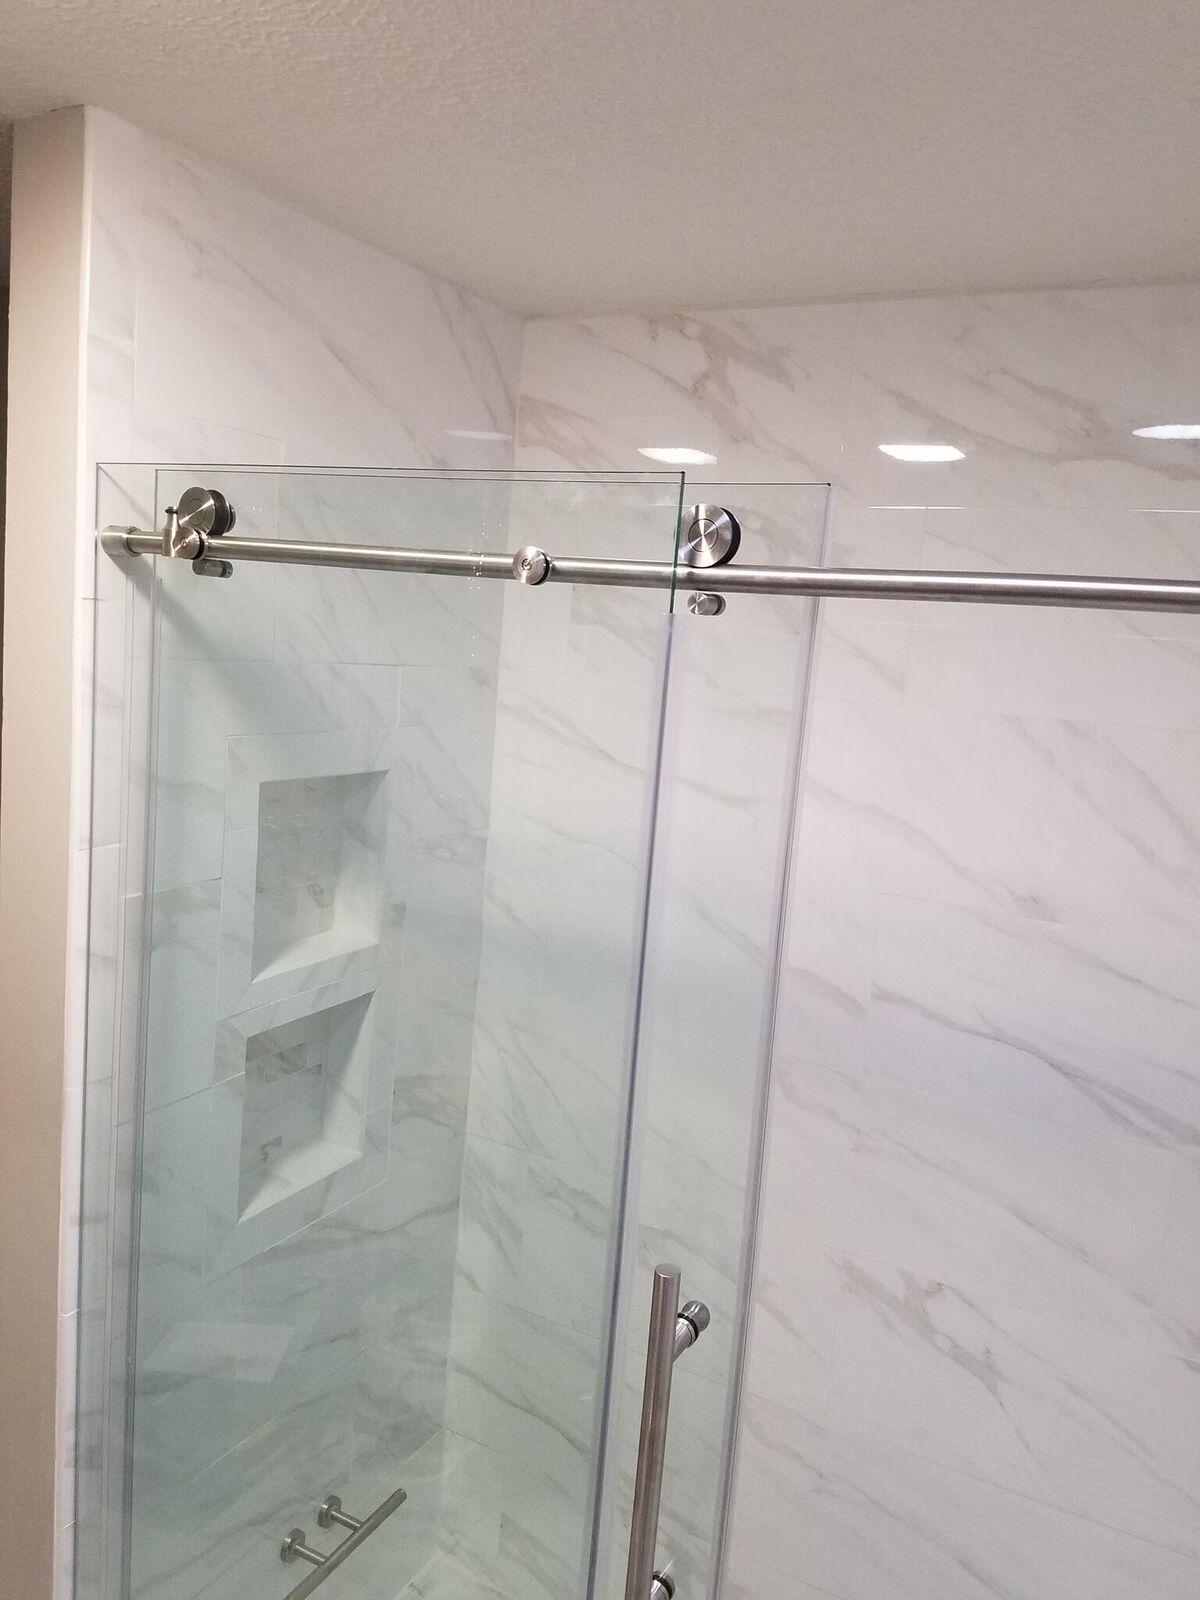 Tile Showers | The Blog That Jack Built